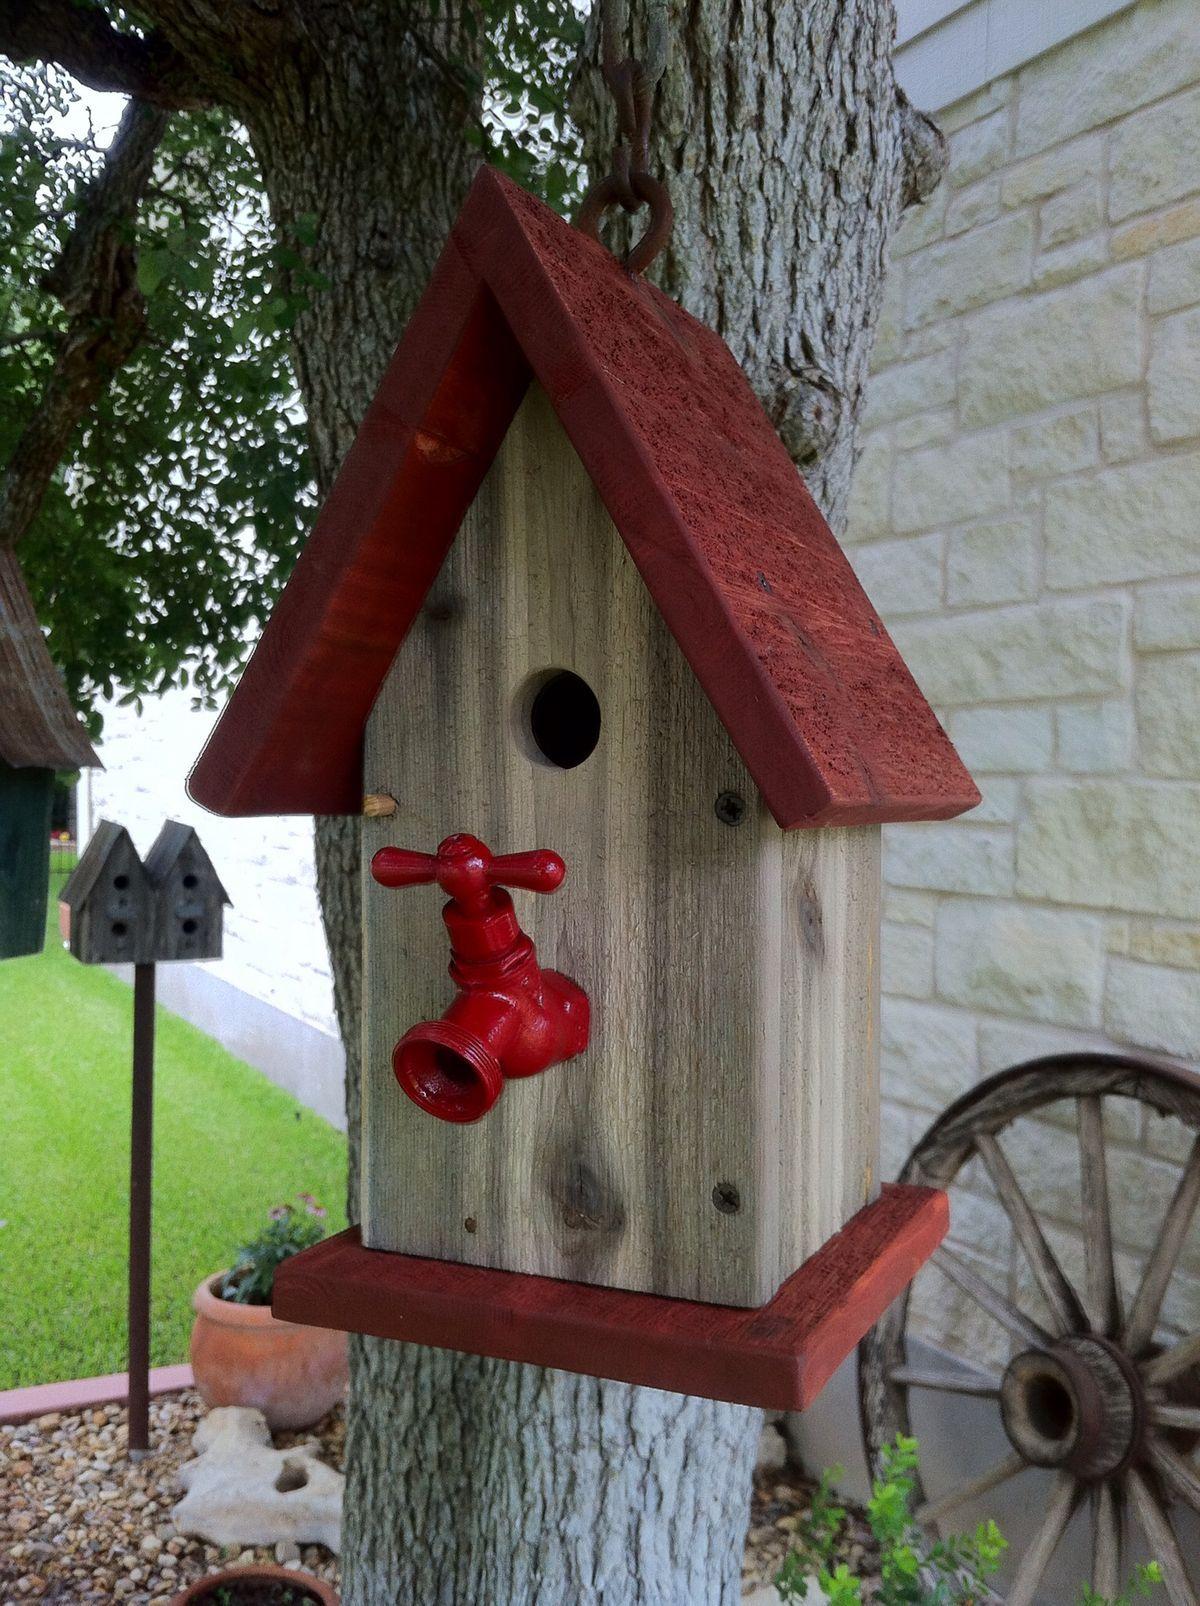 Ecb0f241a10a134c71b83ffcf0c6e700 Jpg 1 200 1 606 Pixels Bird House Bird Houses Diy Bird Houses Painted